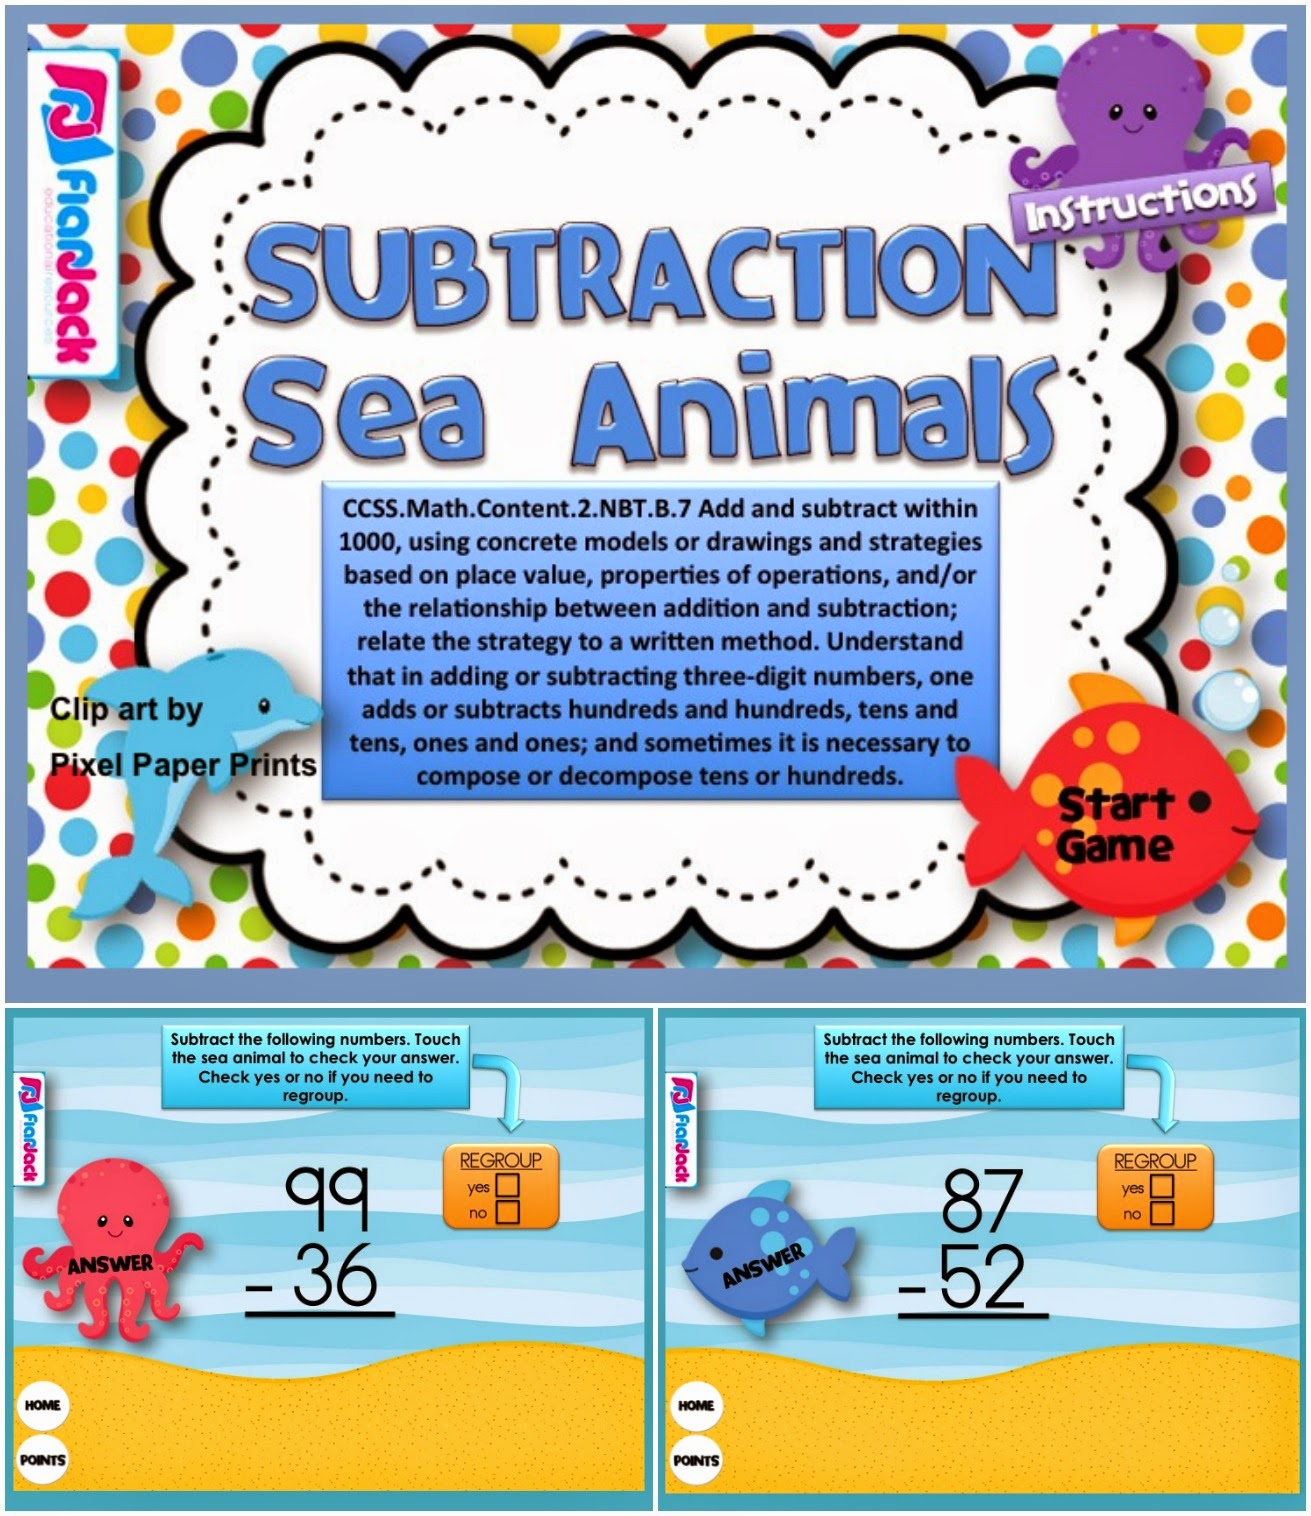 https://www.teacherspayteachers.com/Product/Subtraction-Sea-Animals-Smart-Board-Game-CCSS2NBTB7-1232923